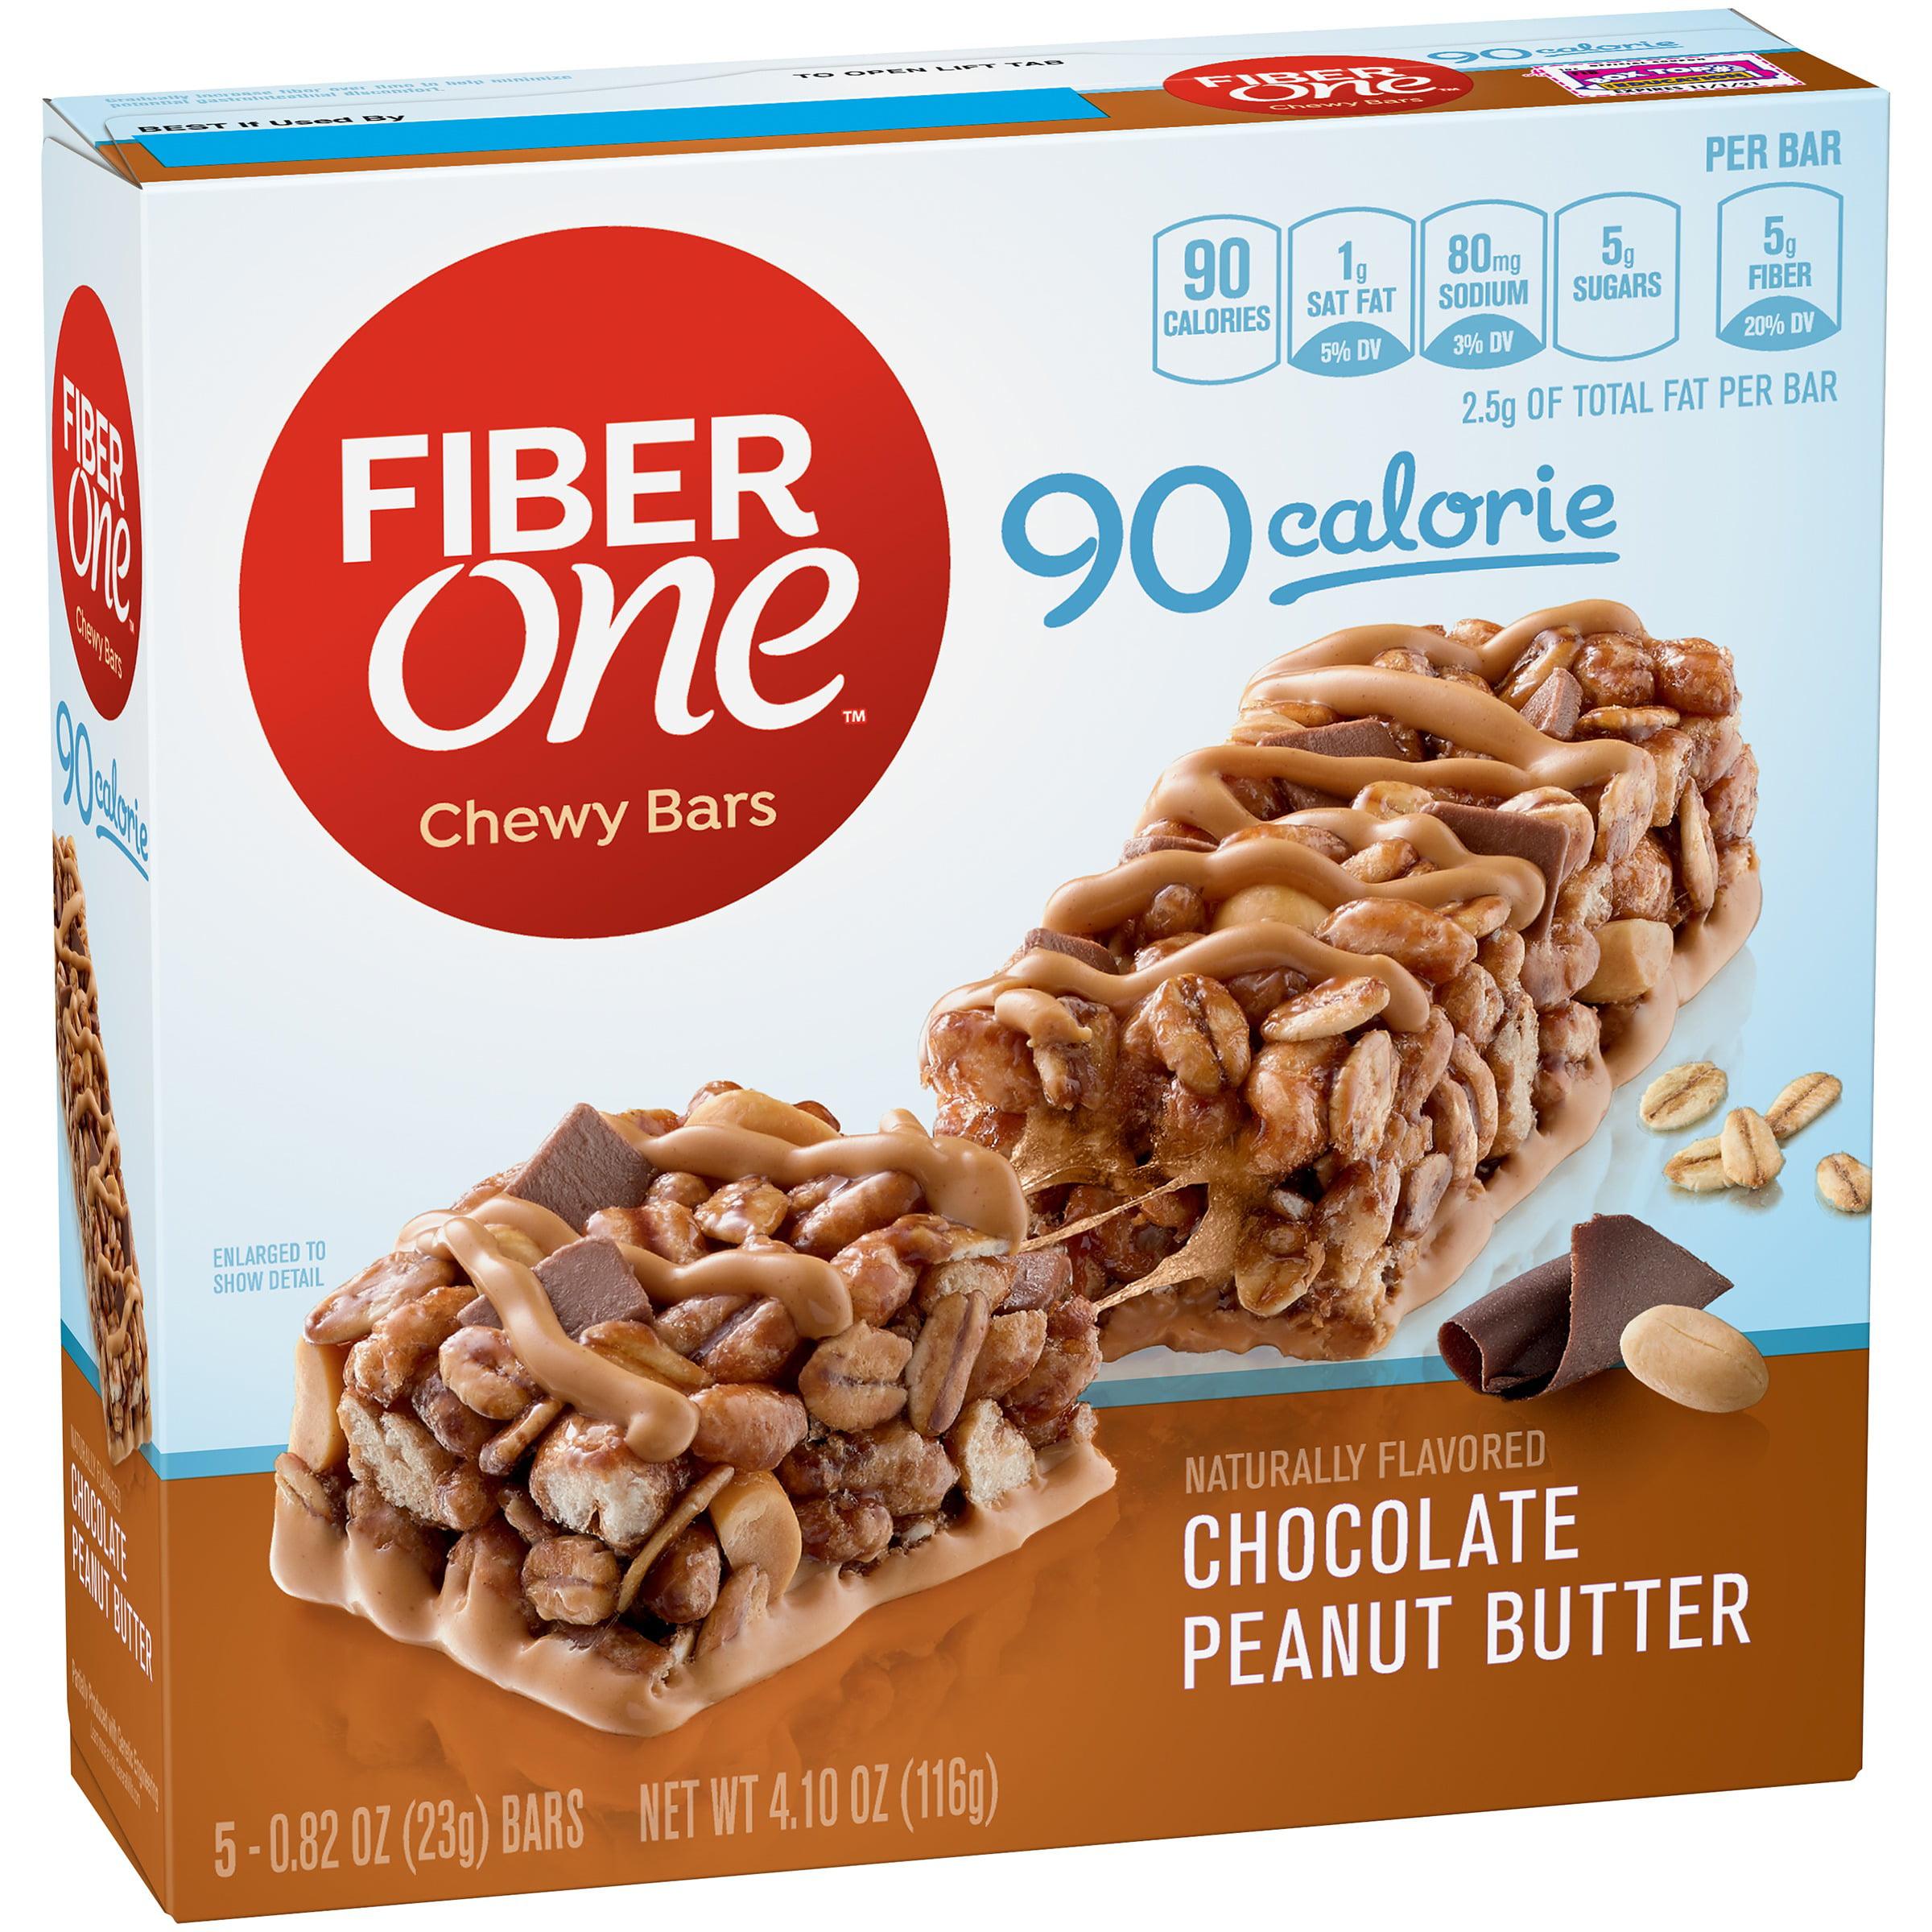 Fiber One 90 Calorie Bar Chocolate Peanut Butter 5 - 0.82 oz Bars